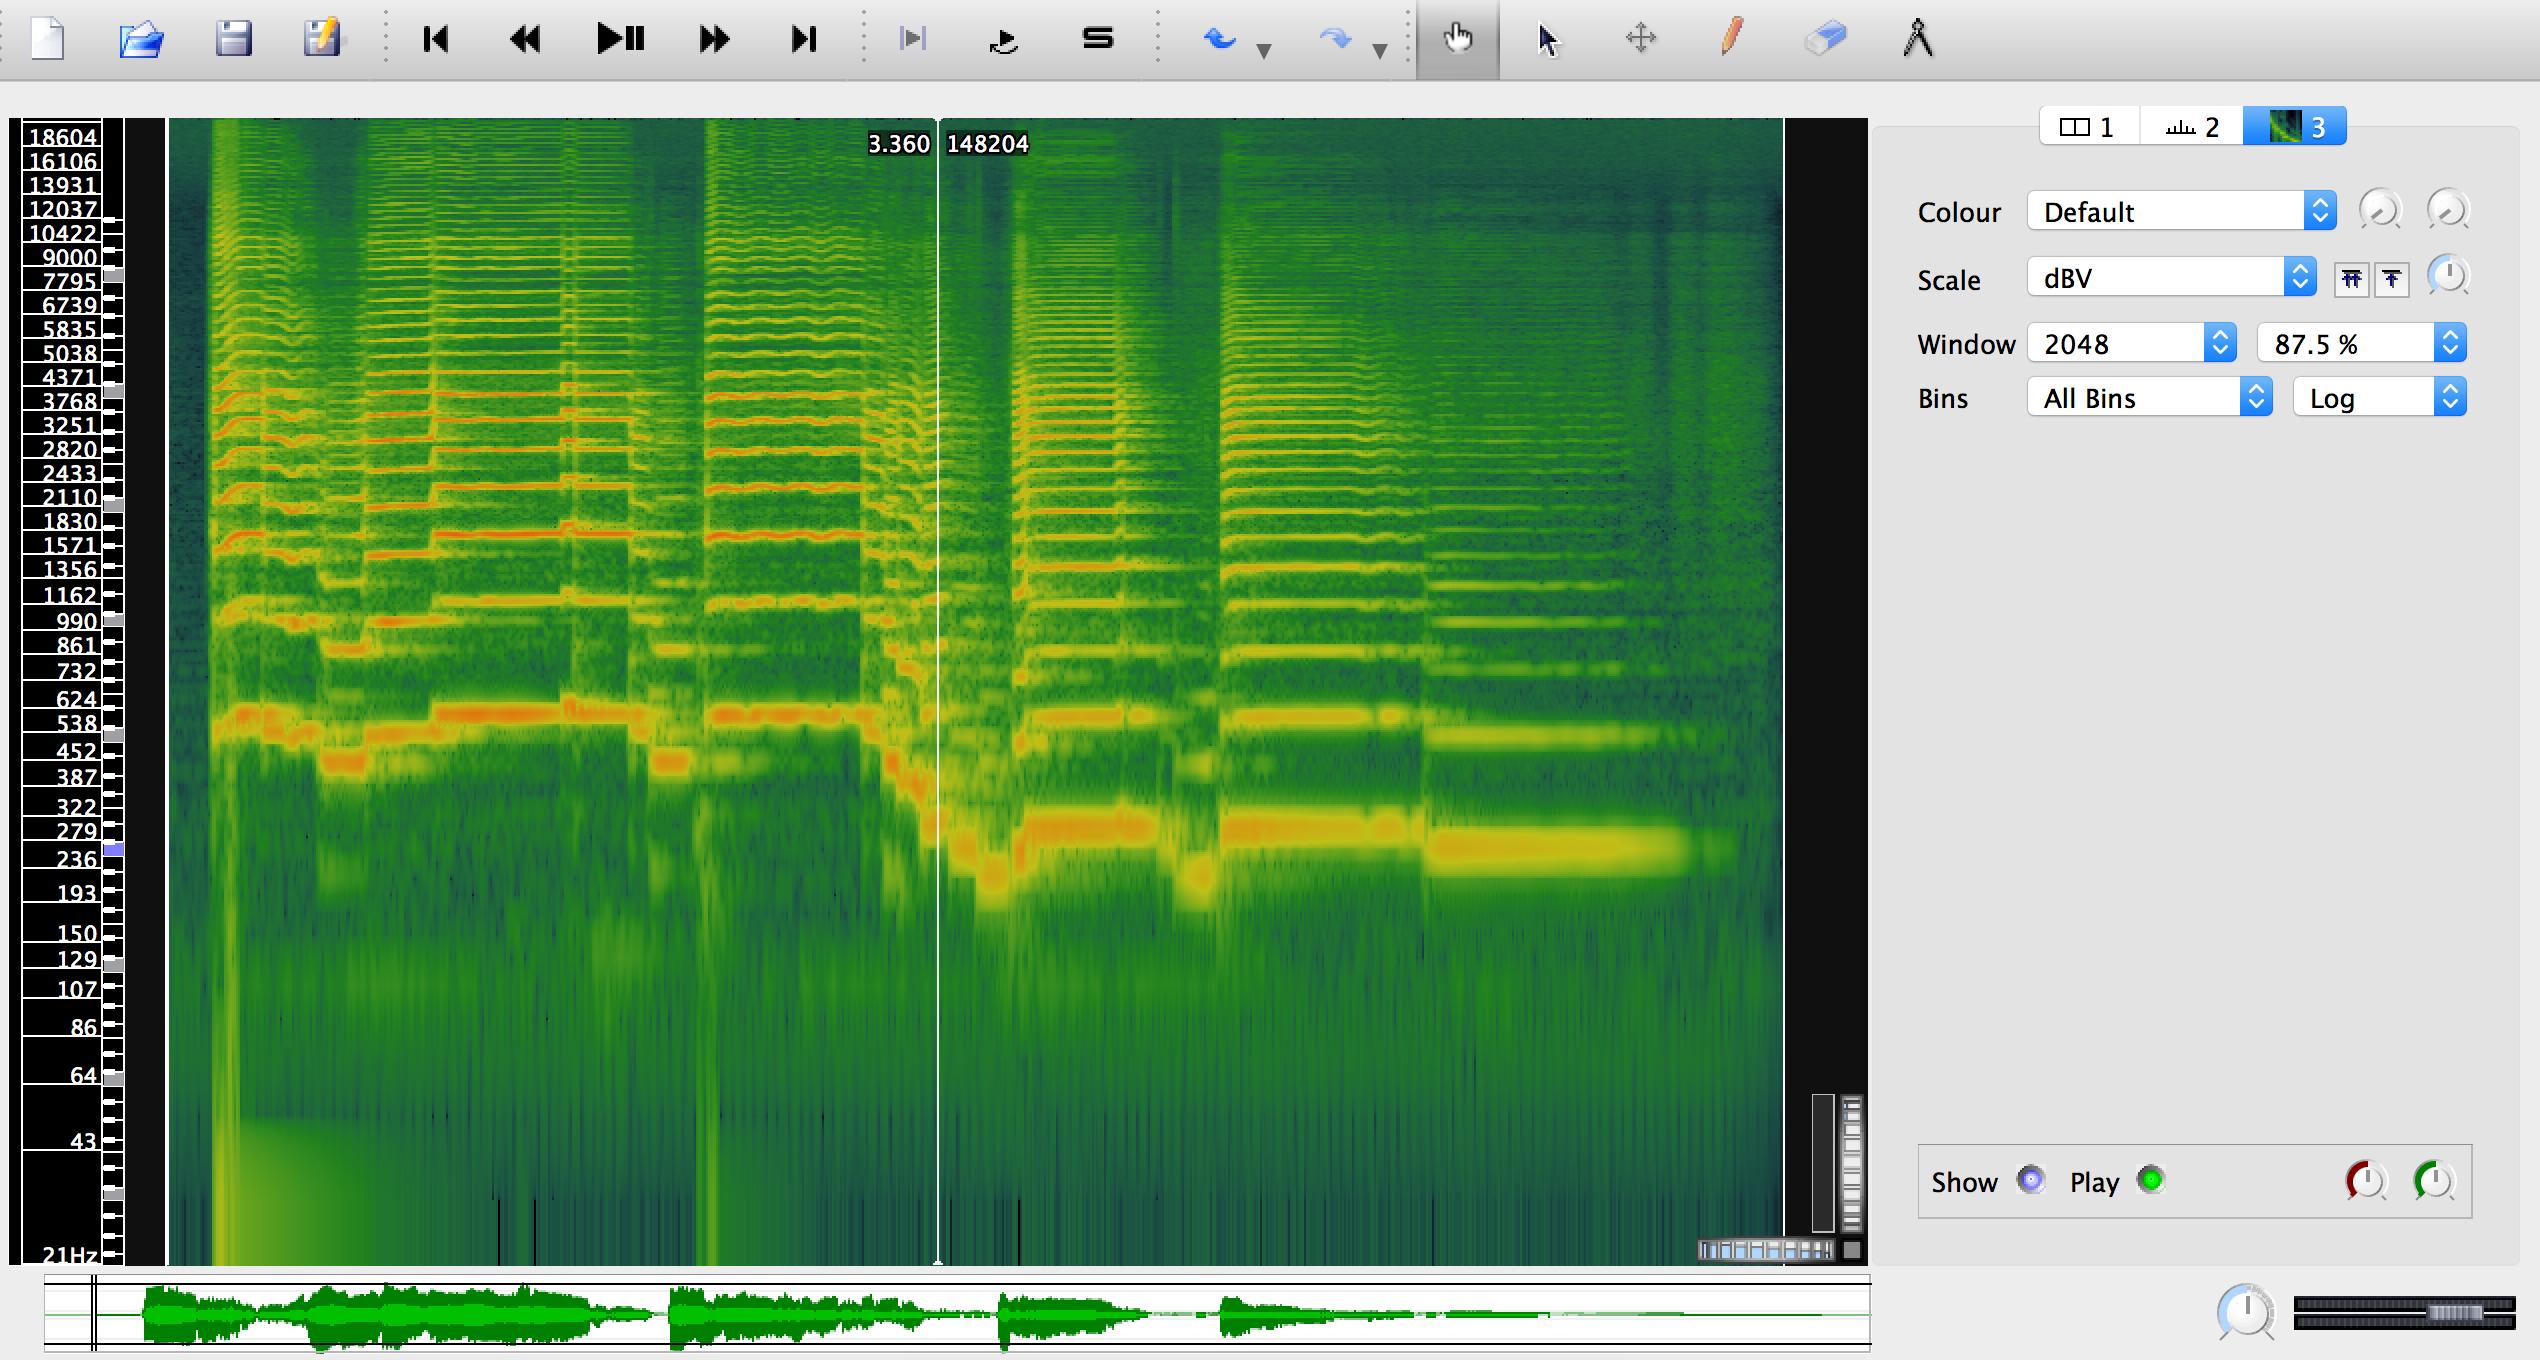 Spectrogram of saxophone melody